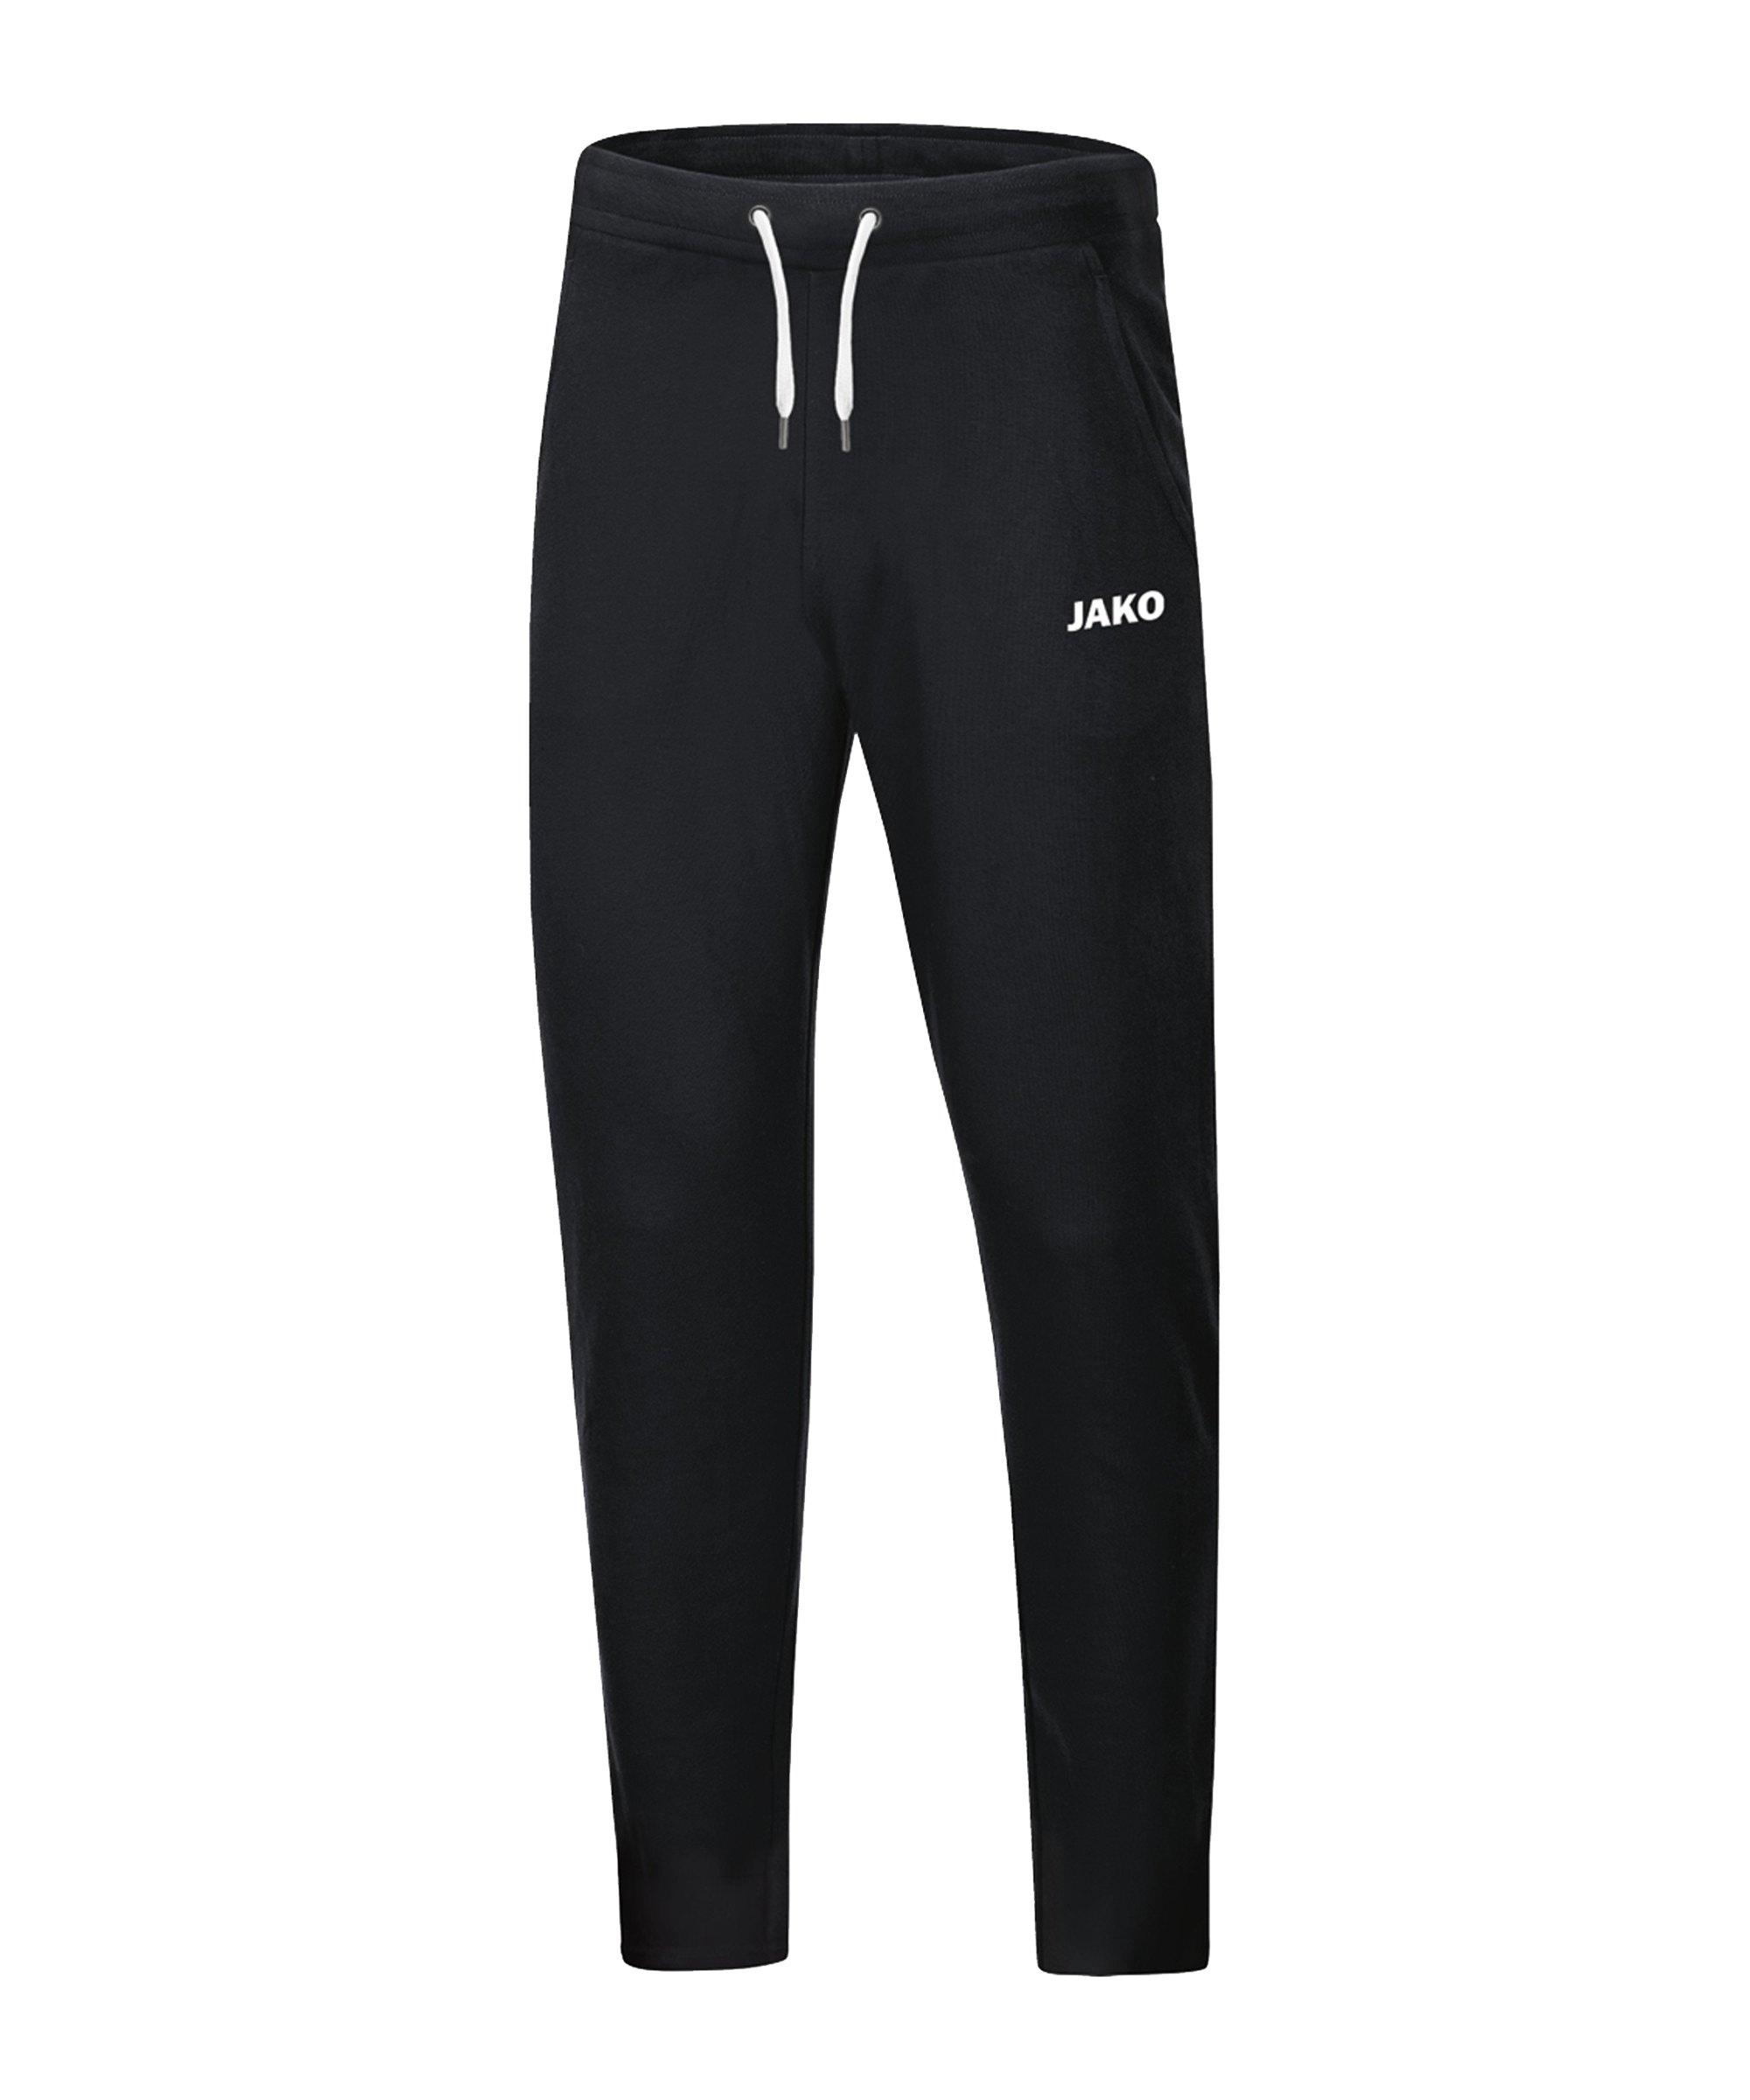 JAKO Base Jogginghose Schwarz F08 - schwarz